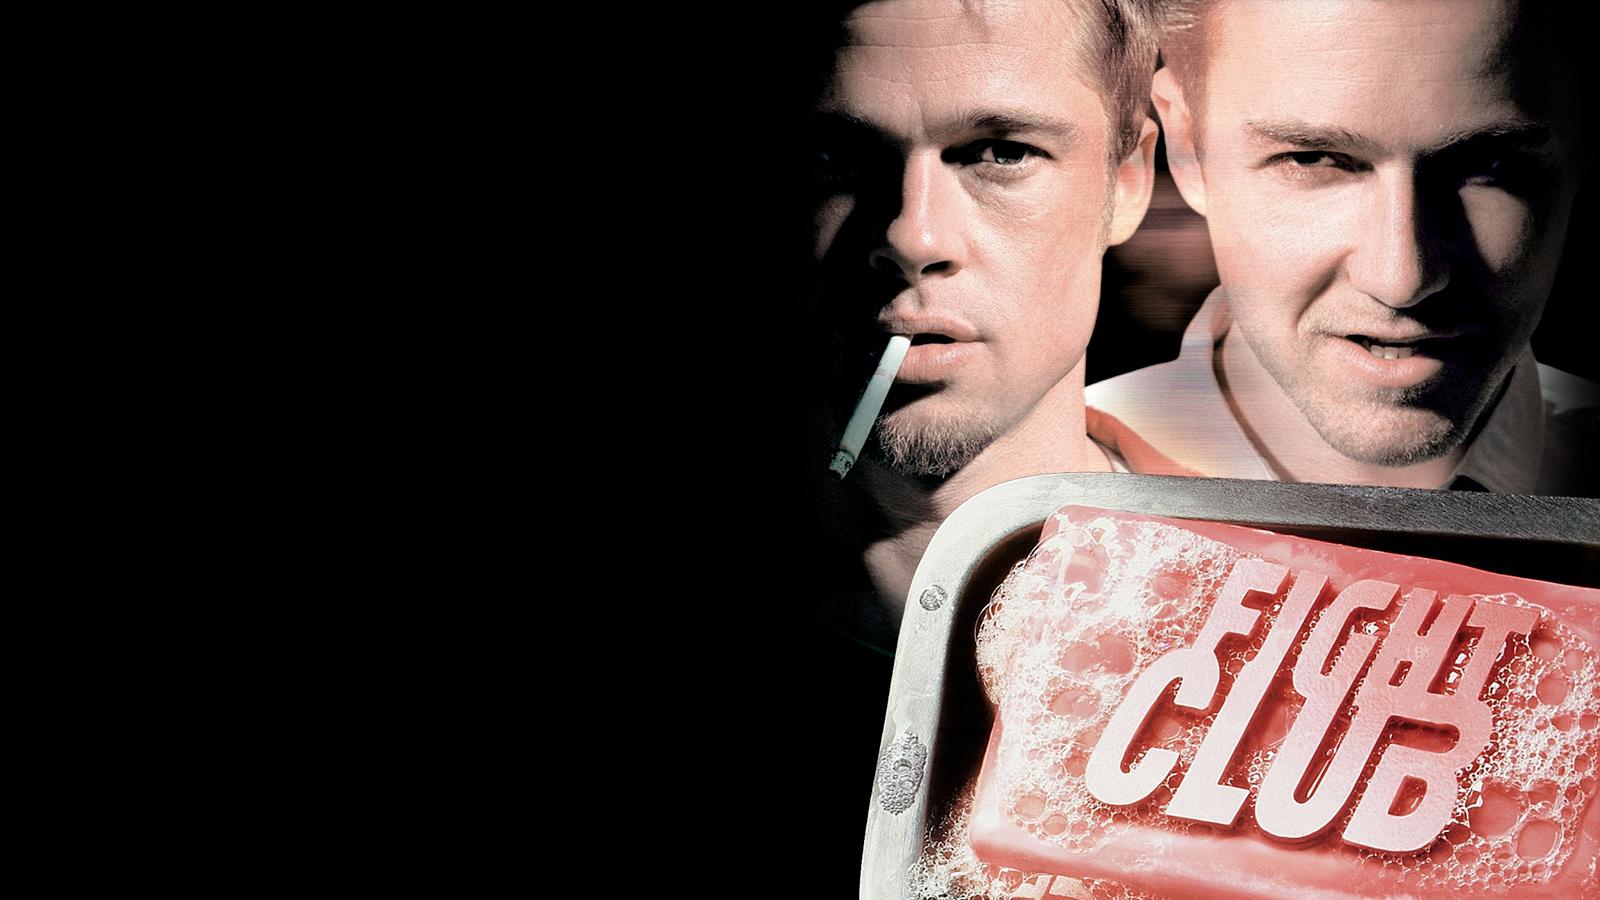 Fight Club Movie The Portfolio of Ross Hoddinott 1600x900